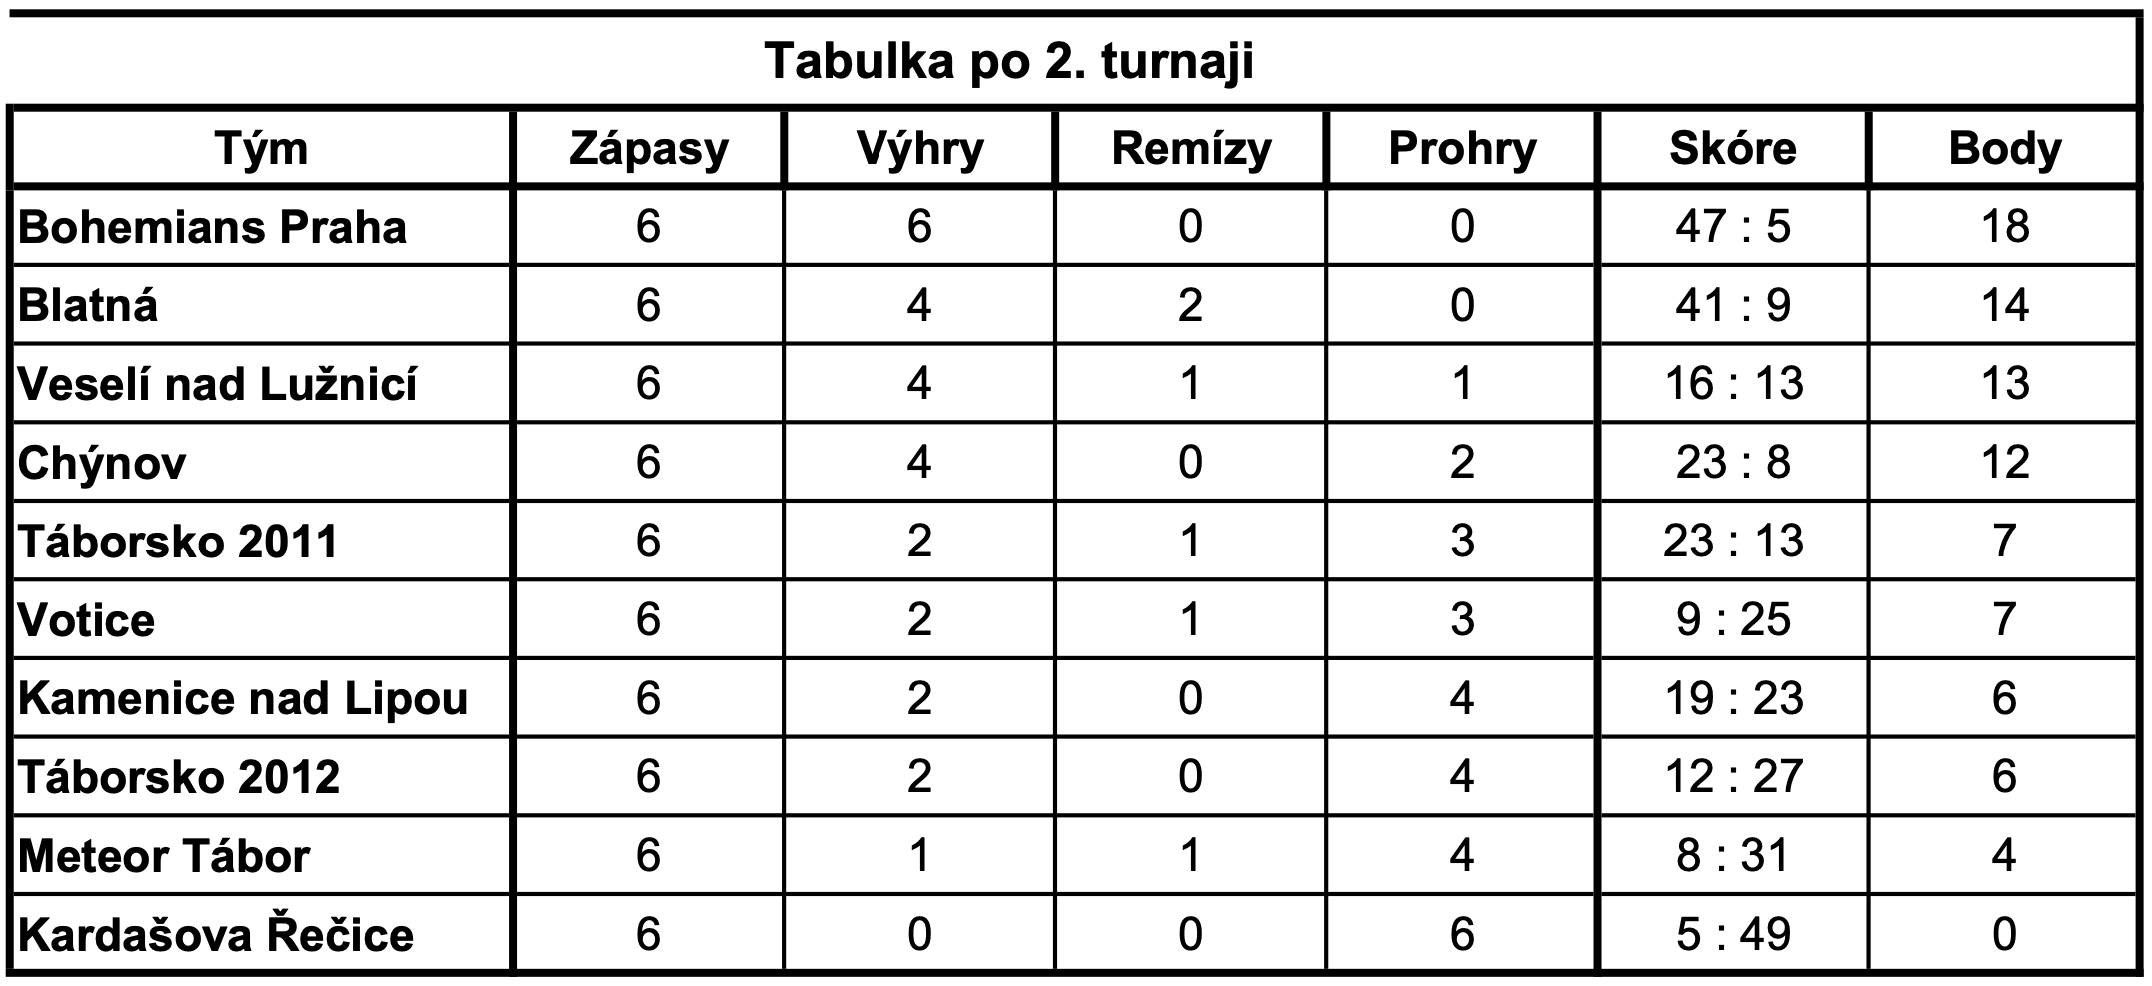 tabulka2turnajmlp